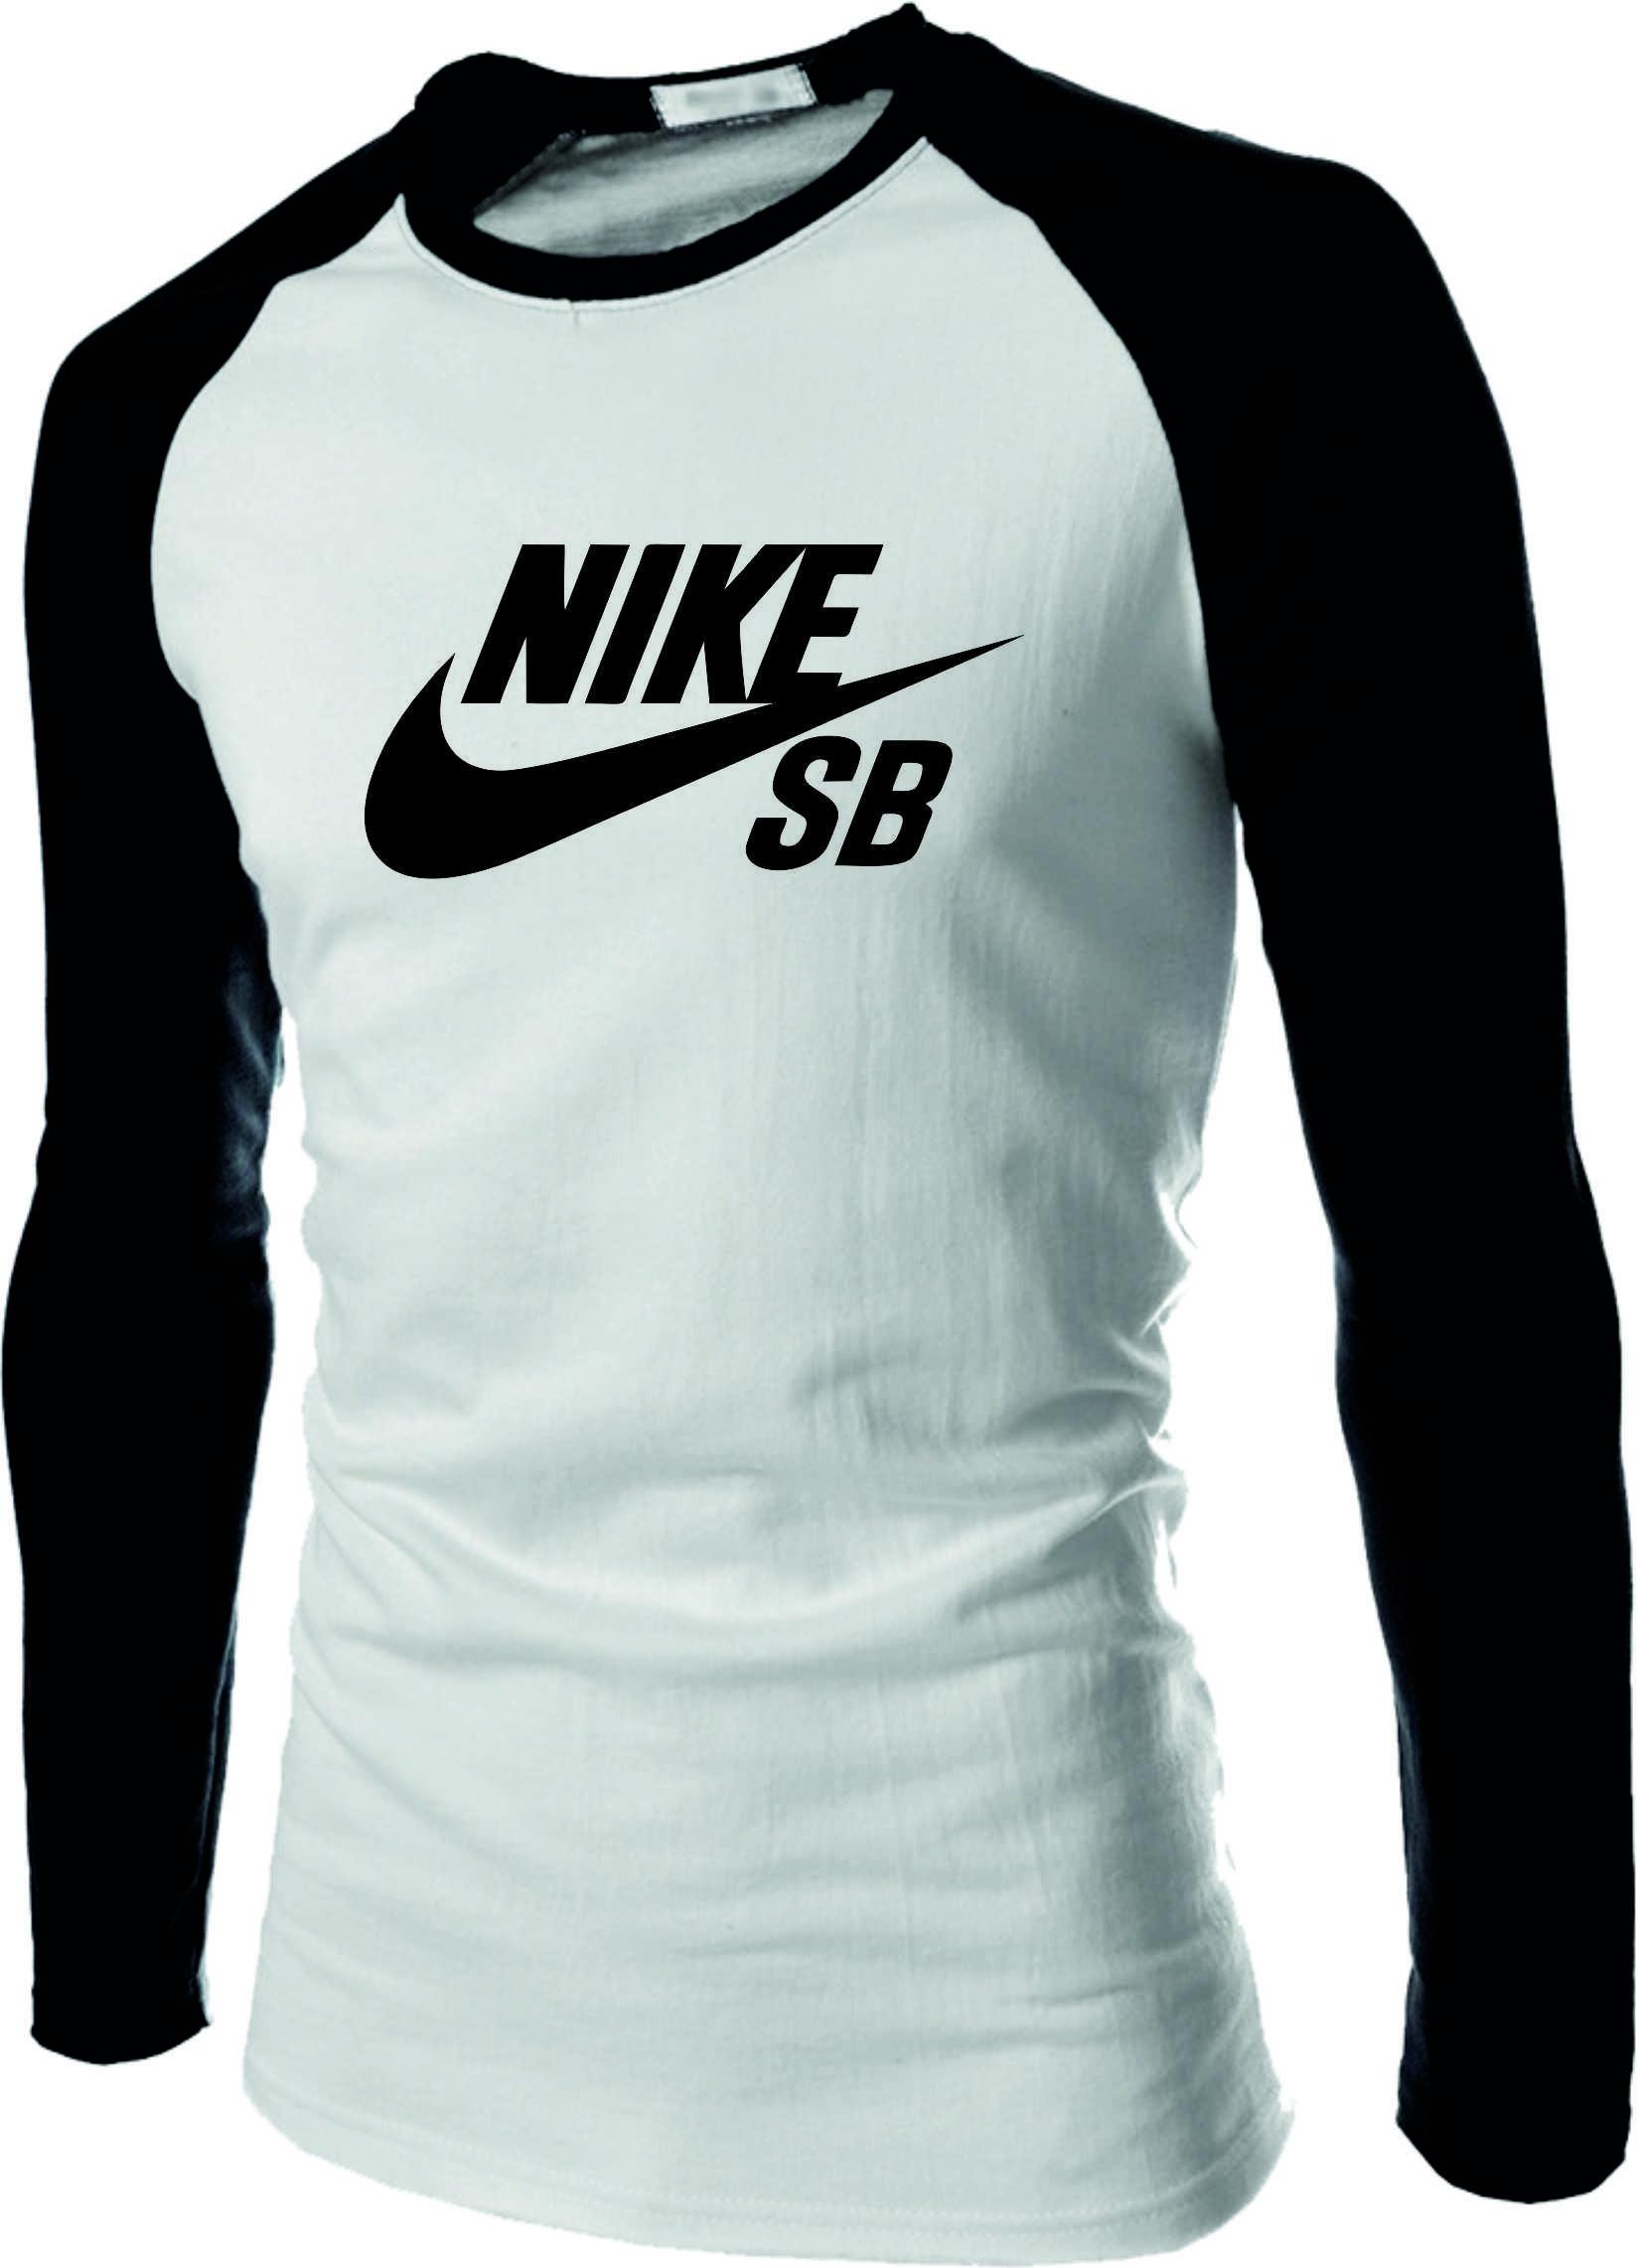 Personalizadas Nike Raglan Longa No Camiseta Manga Elo7 Camisetas q0txdTB